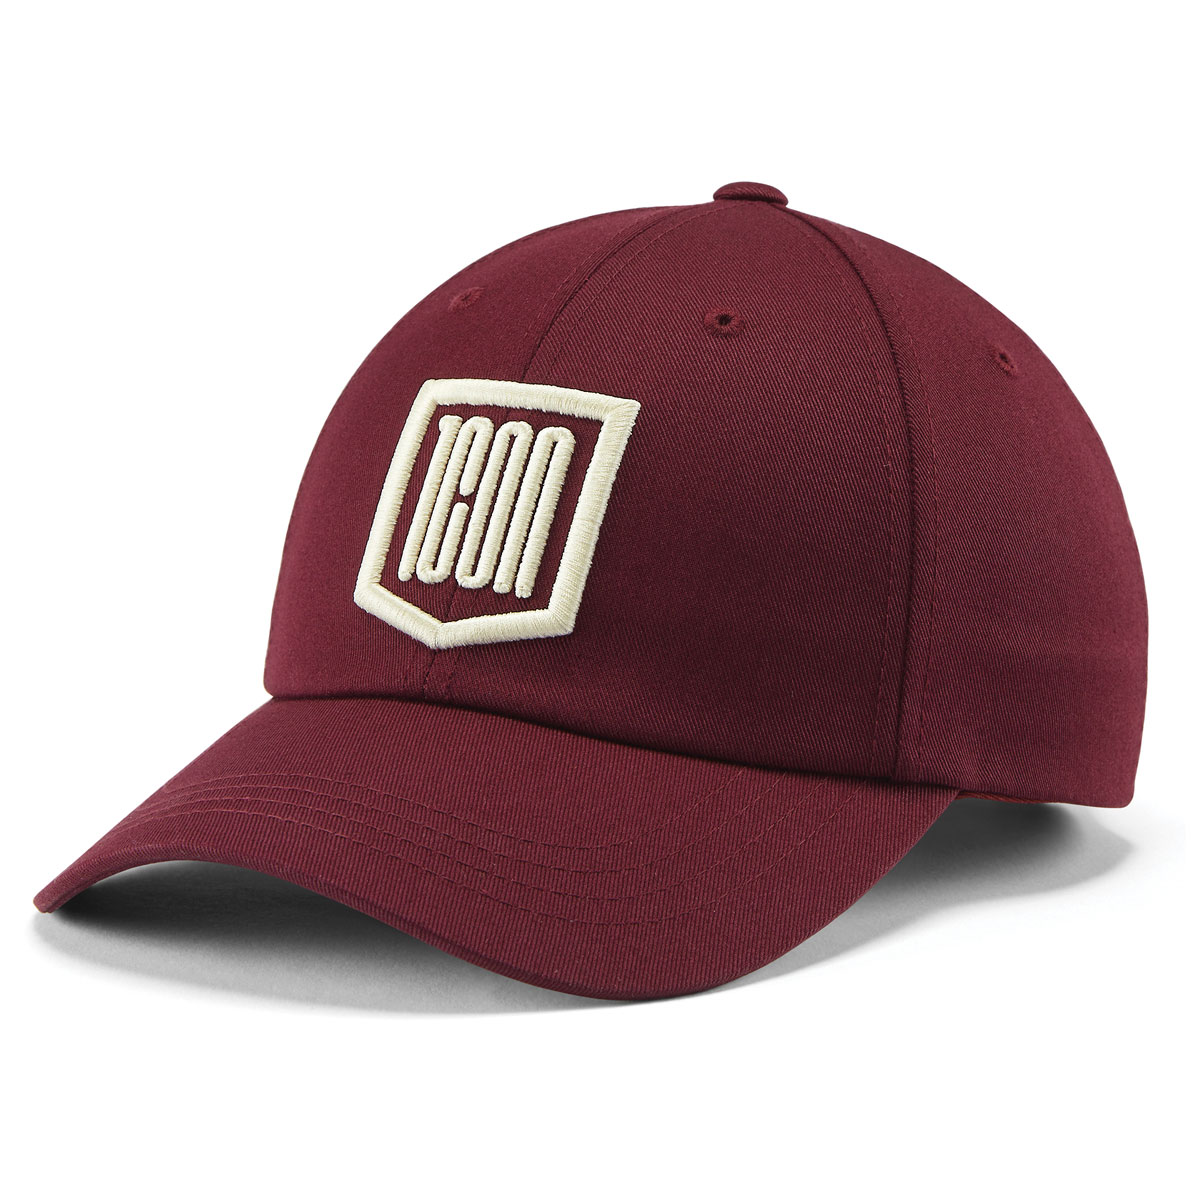 ICON One Thousand Rad Dad Maroon Hat